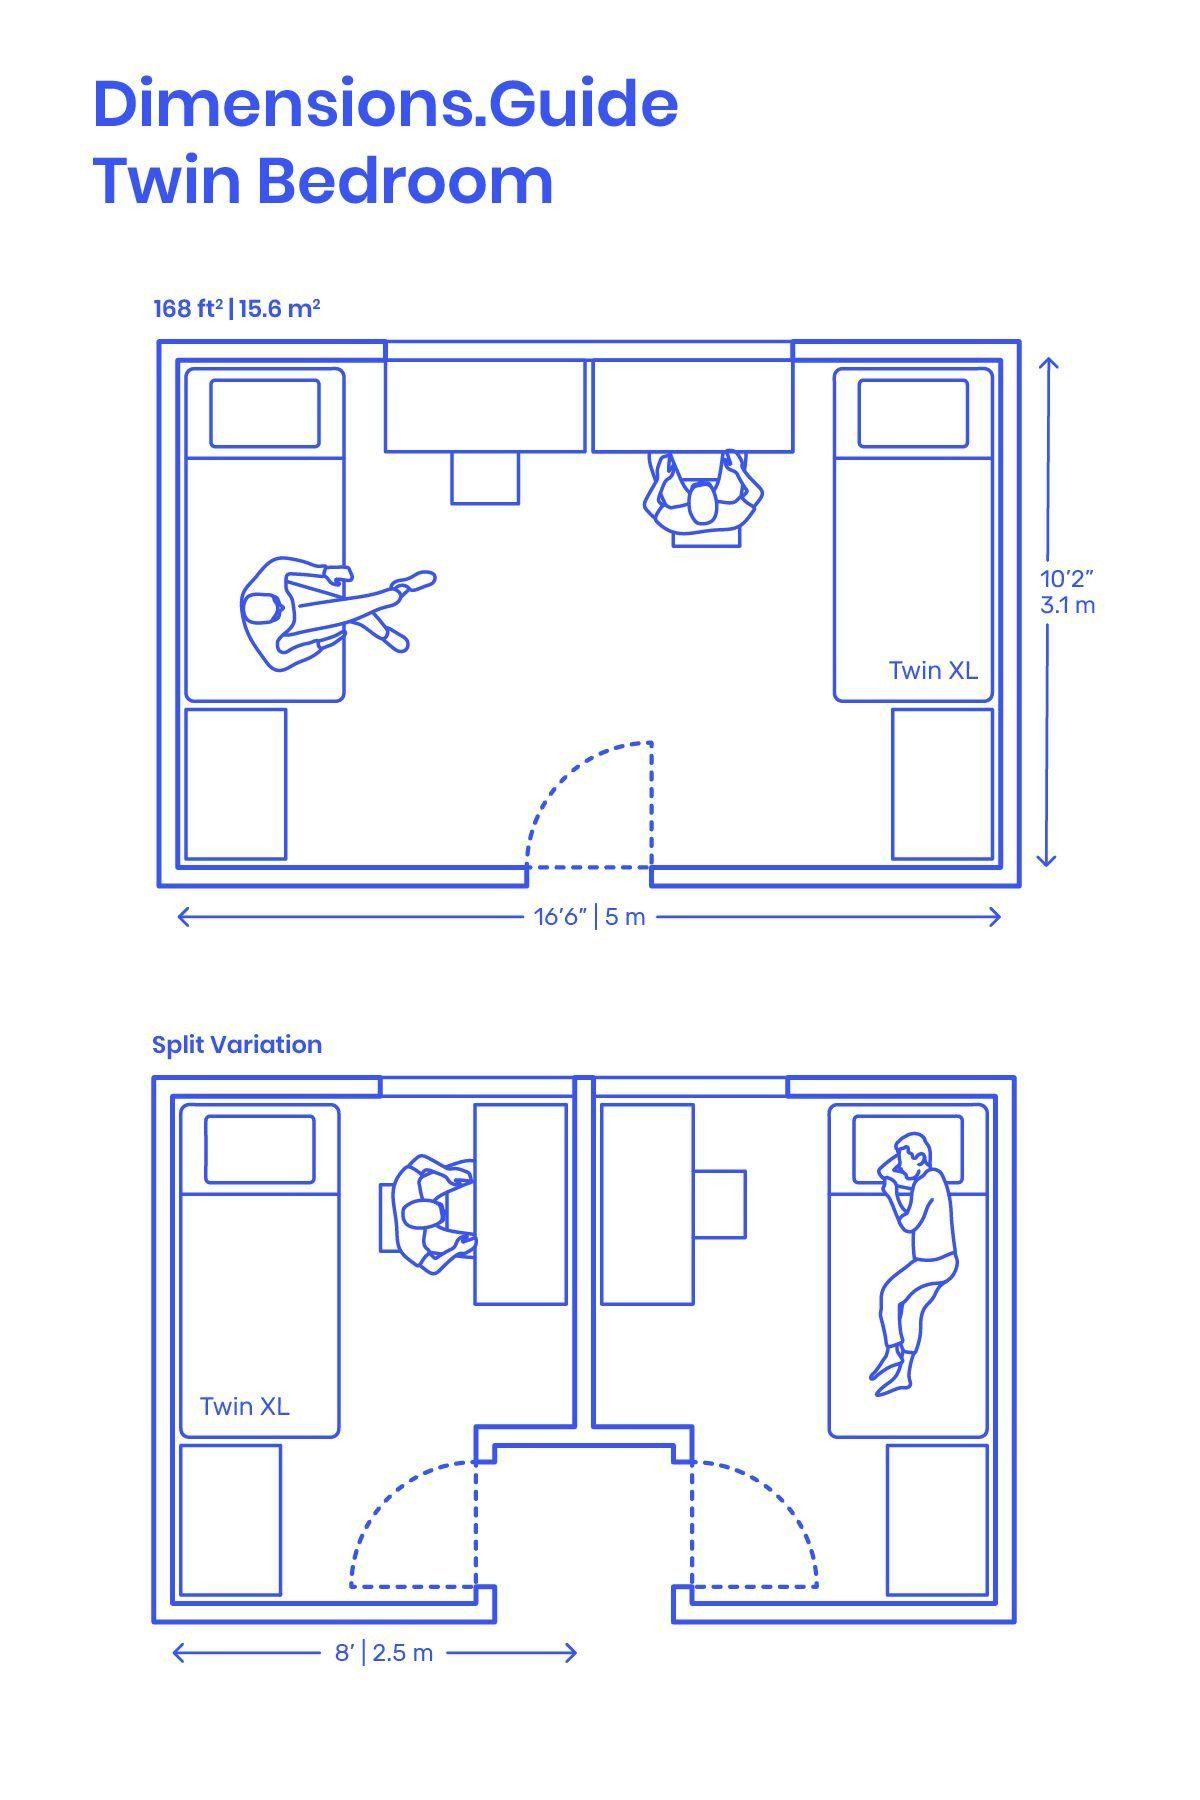 Average Size Master Bedroom Square Feet In 2020 Master Bedroom Layout Bedroom Layouts Twin Bedroom